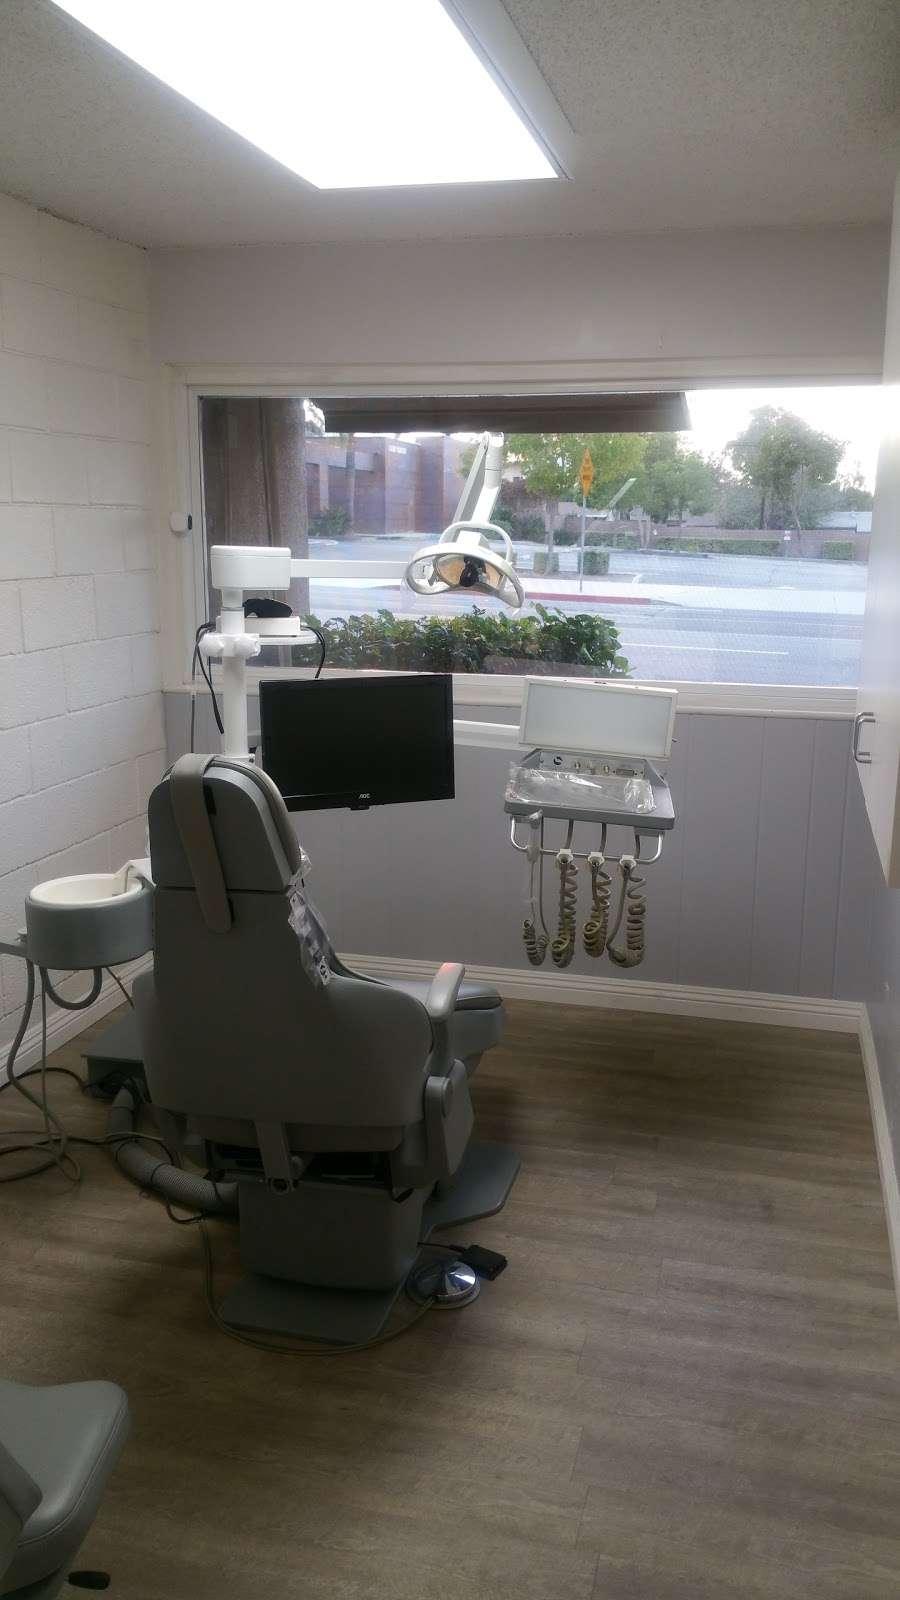 Kilzi Dental Corp - dentist    Photo 2 of 6   Address: B, 4455, 1113, S Main St, Corona, CA 92882, USA   Phone: (951) 739-0752